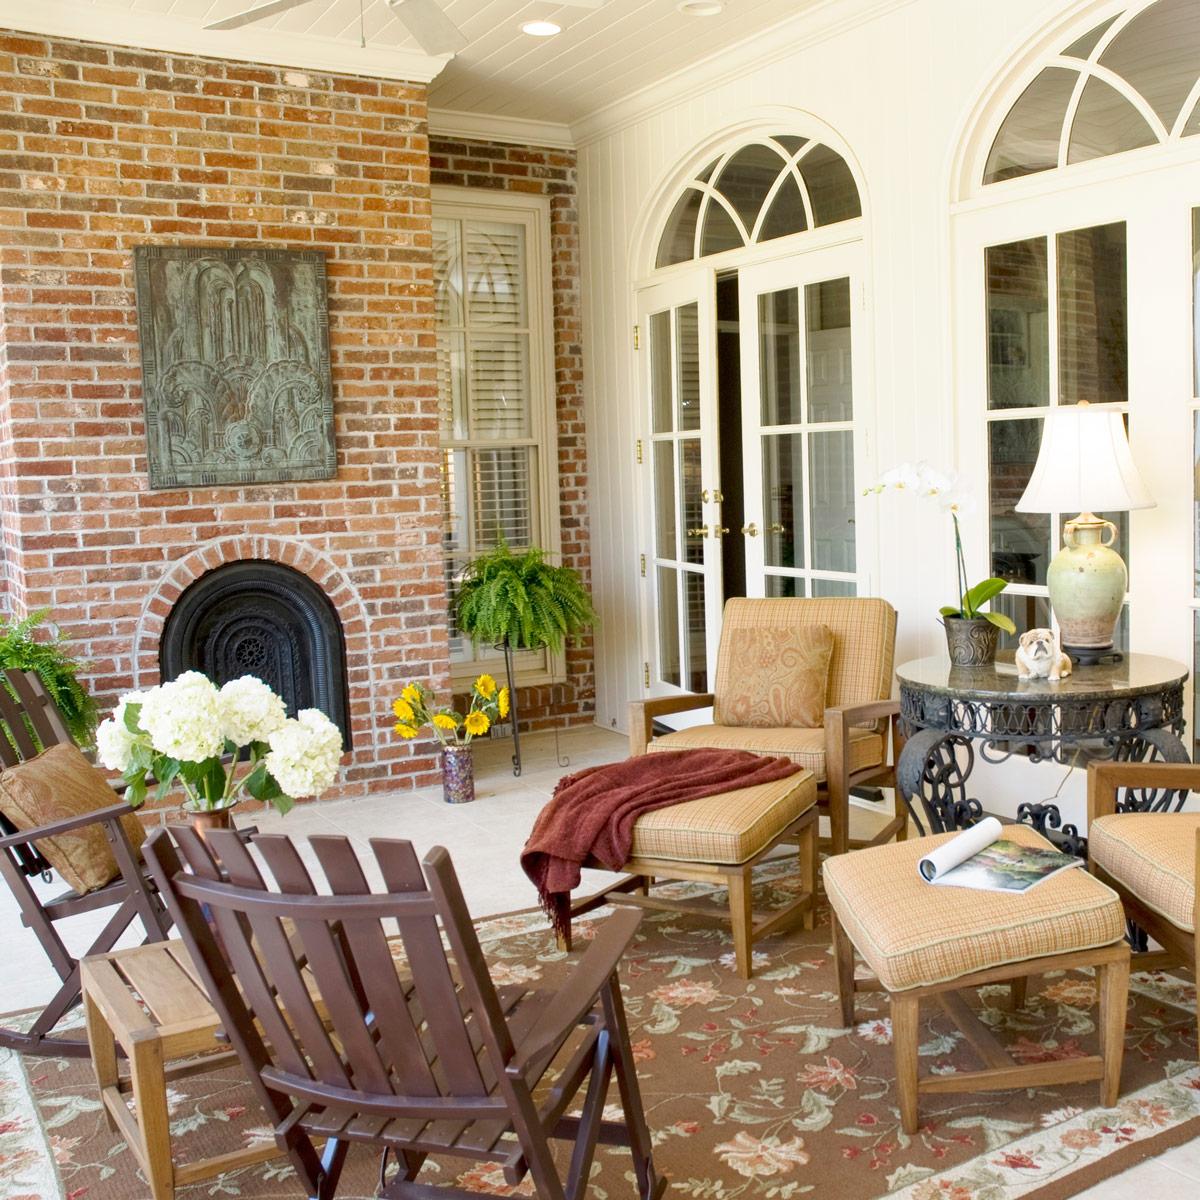 David Watkins Design Interior In Greenville Sc